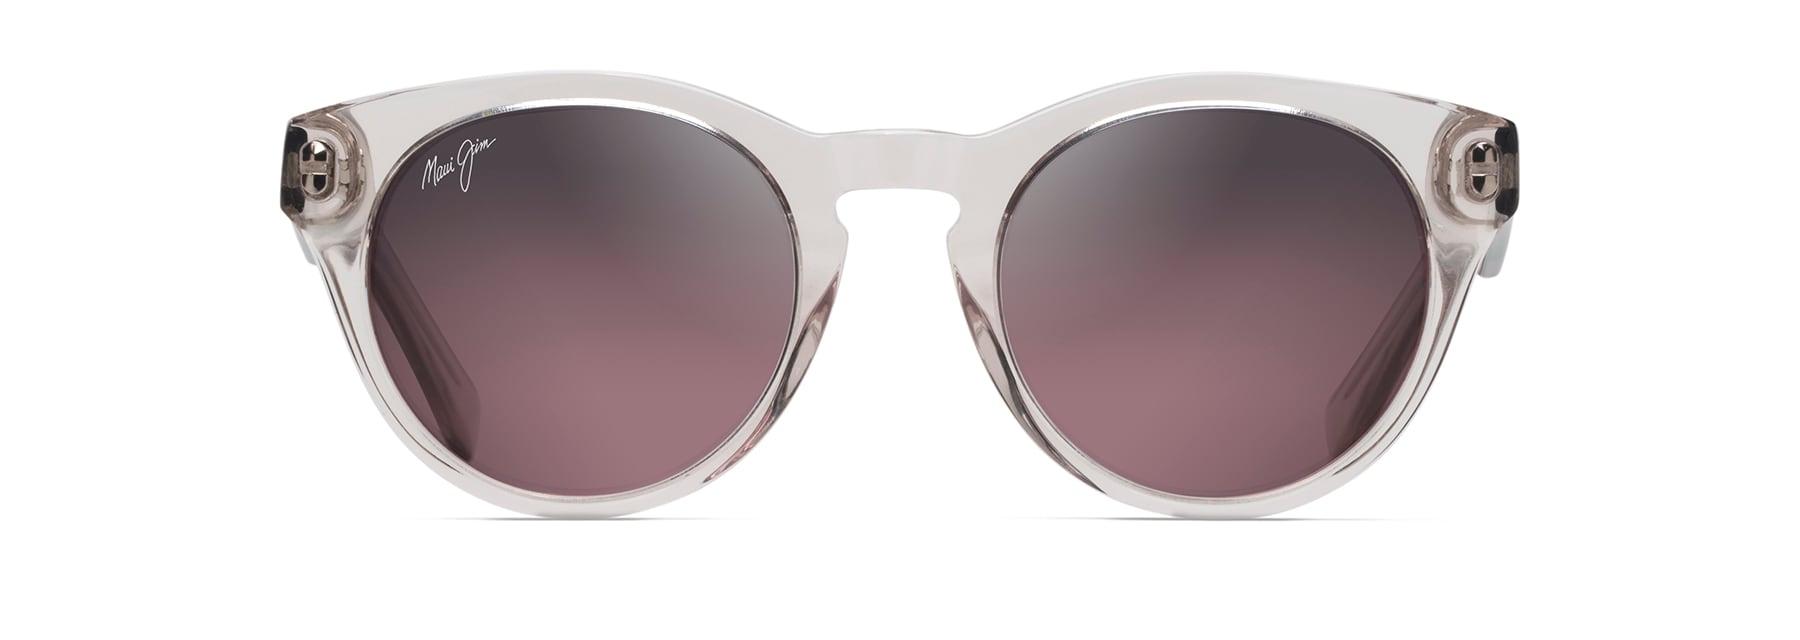 95d51f6172 Dragonfly Polarisierte Sonnenbrille